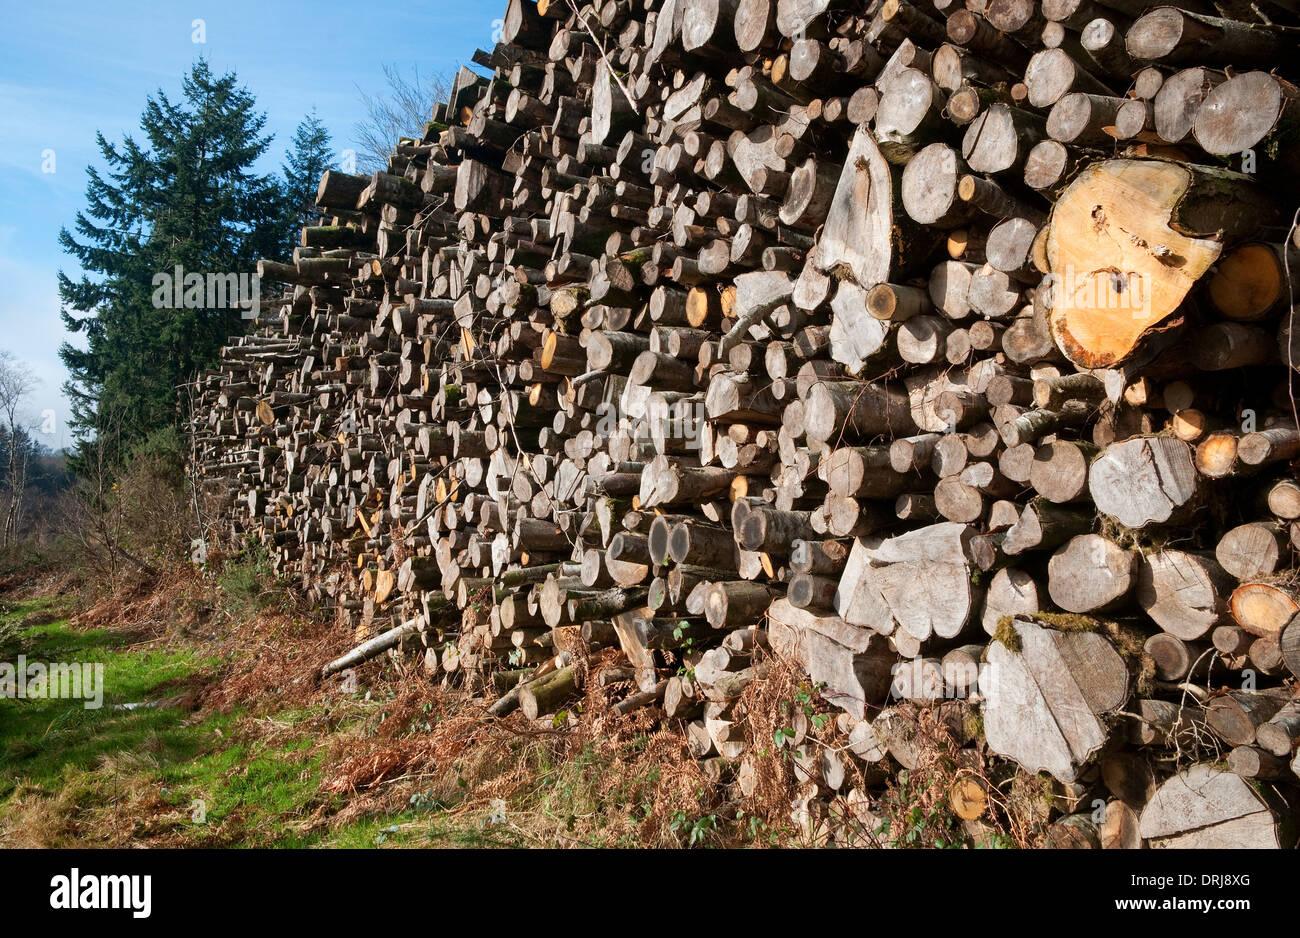 saint sever forest national park, calvados, normandy, france - Stock Image